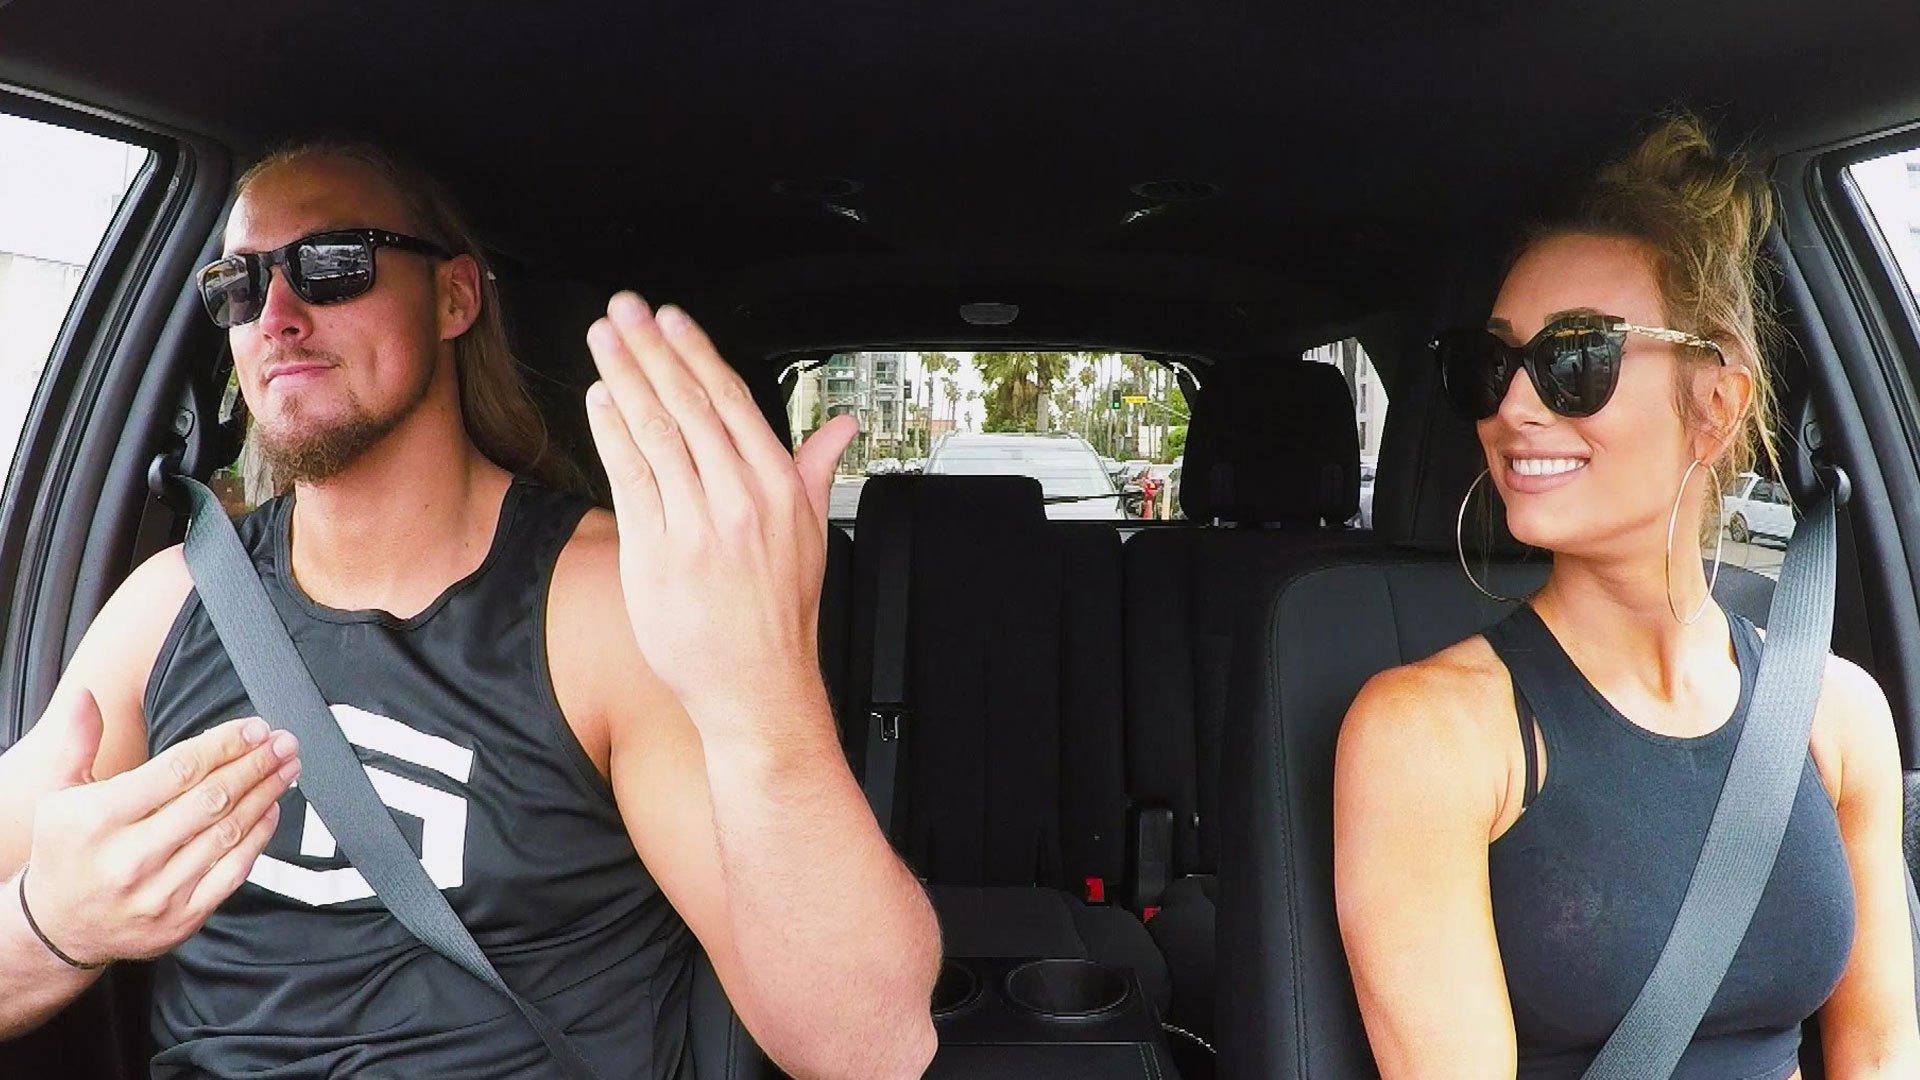 Carmella and Big Cass go house-hunting in Los Angeles: Total Divas Bonus Clip, Nov. 15, 2017